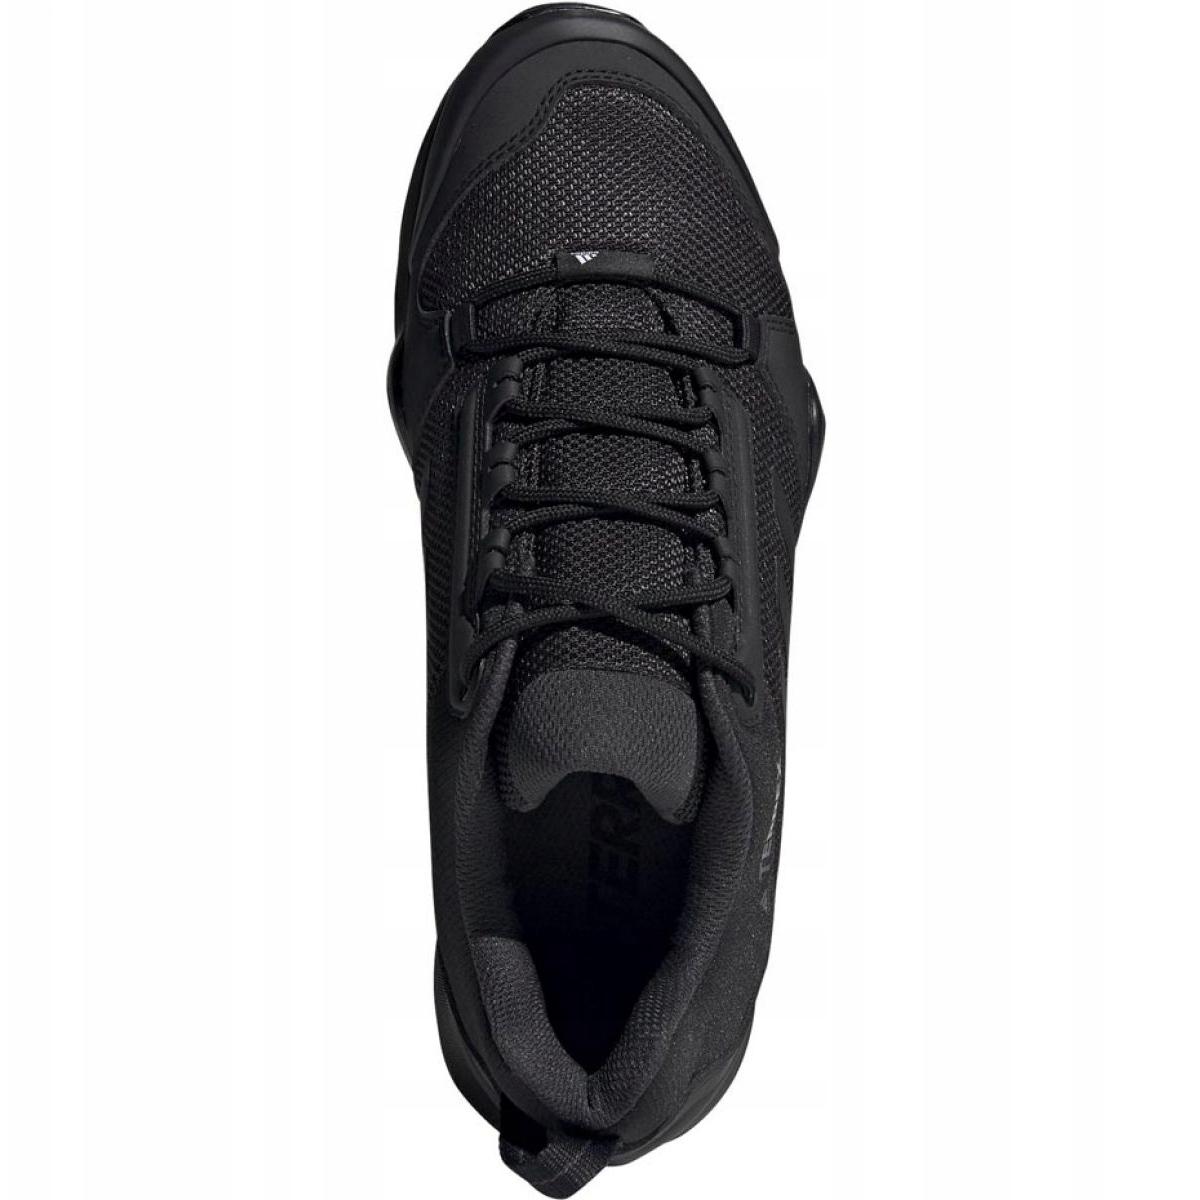 Trekking shoes adidas Terrex AX3 M